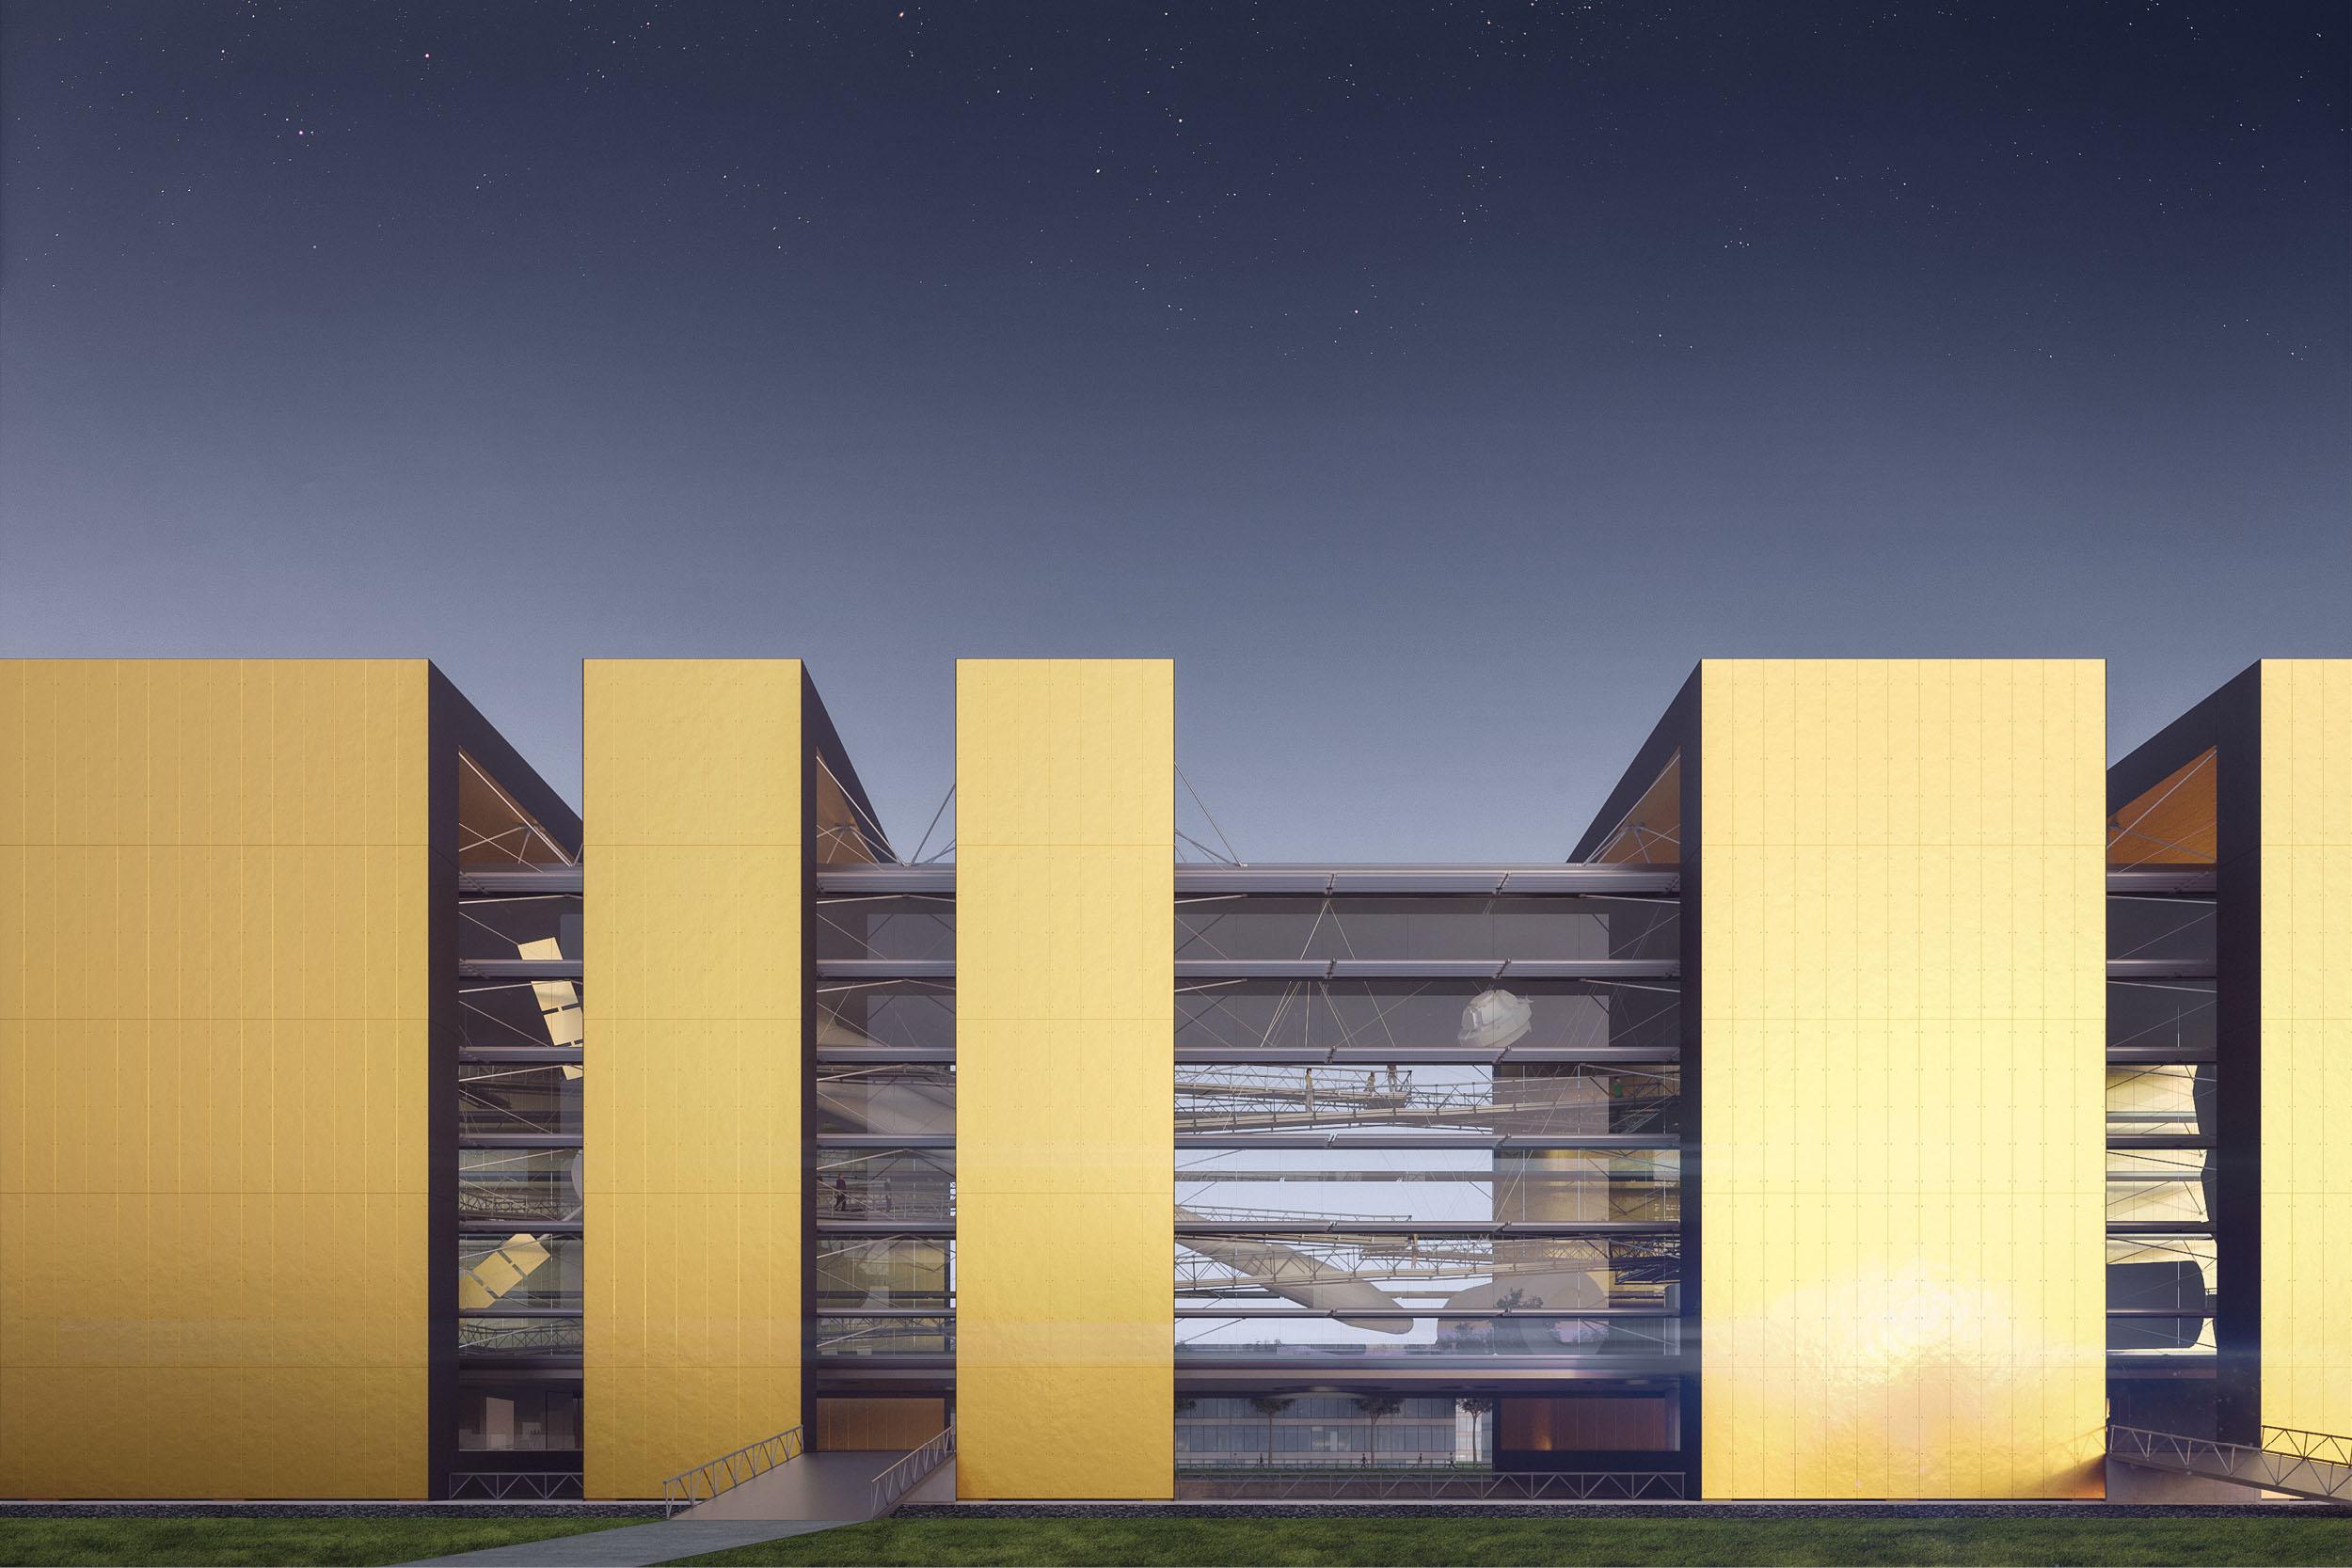 Szemerey-Daniel-ESA-Museum-Hellodesign-10.jpg